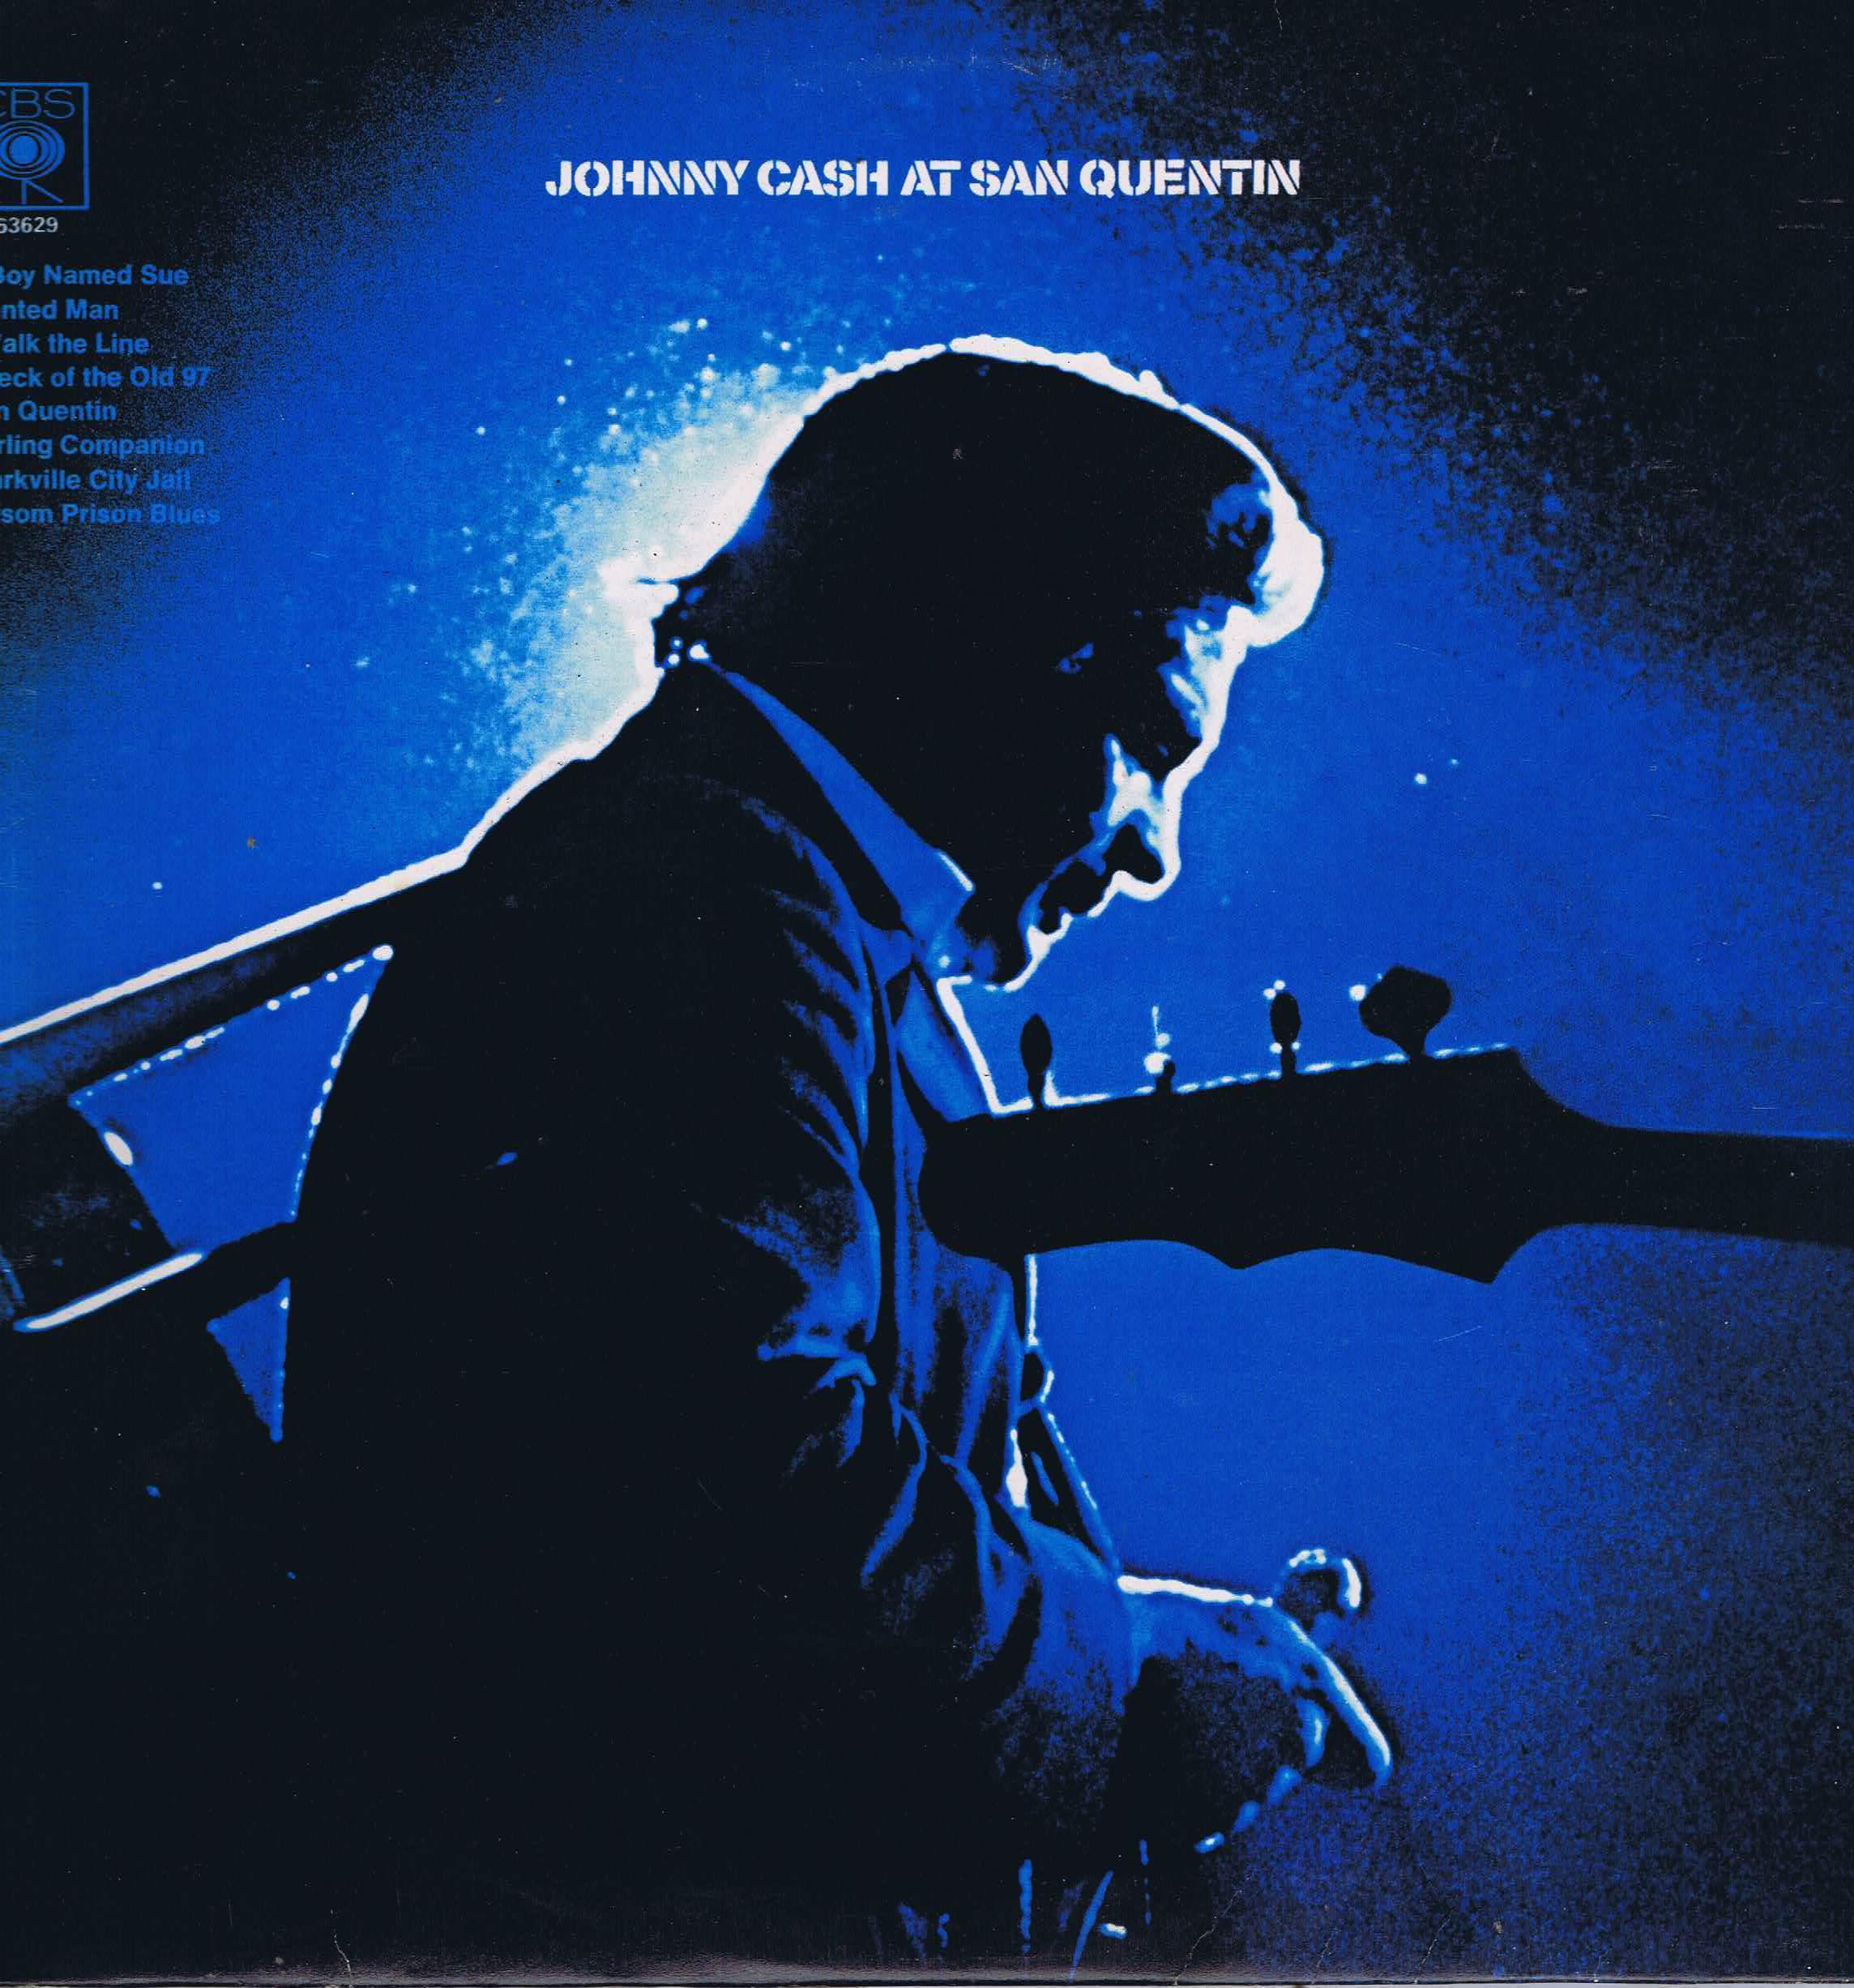 Johnny Cash At San Quentin Cbs 63629 Lp Vinyl Record